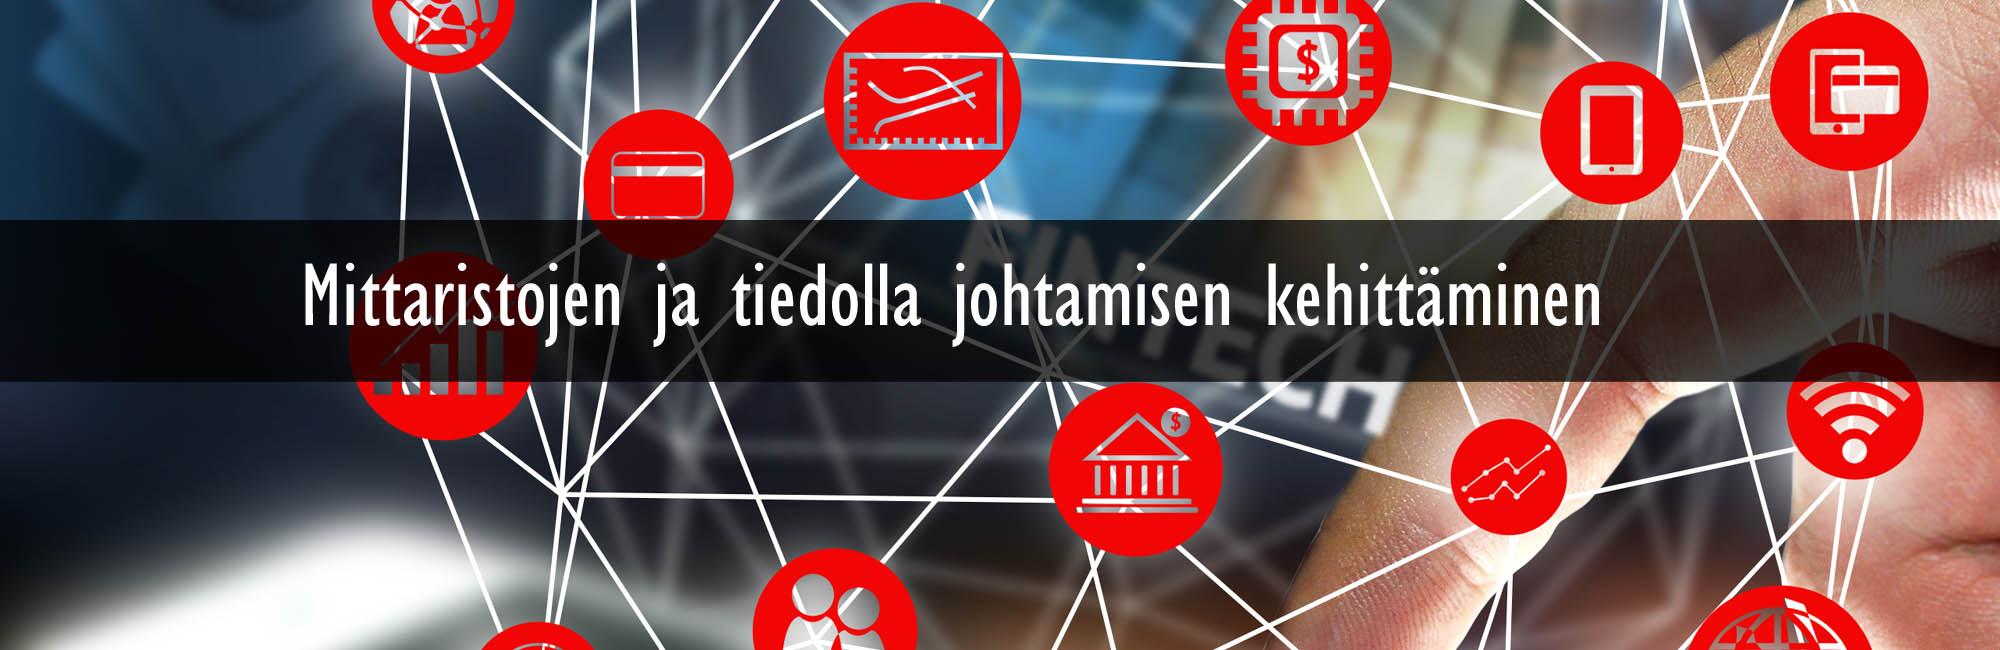 Referenssi: Helsingin OP Pankki – Melkior